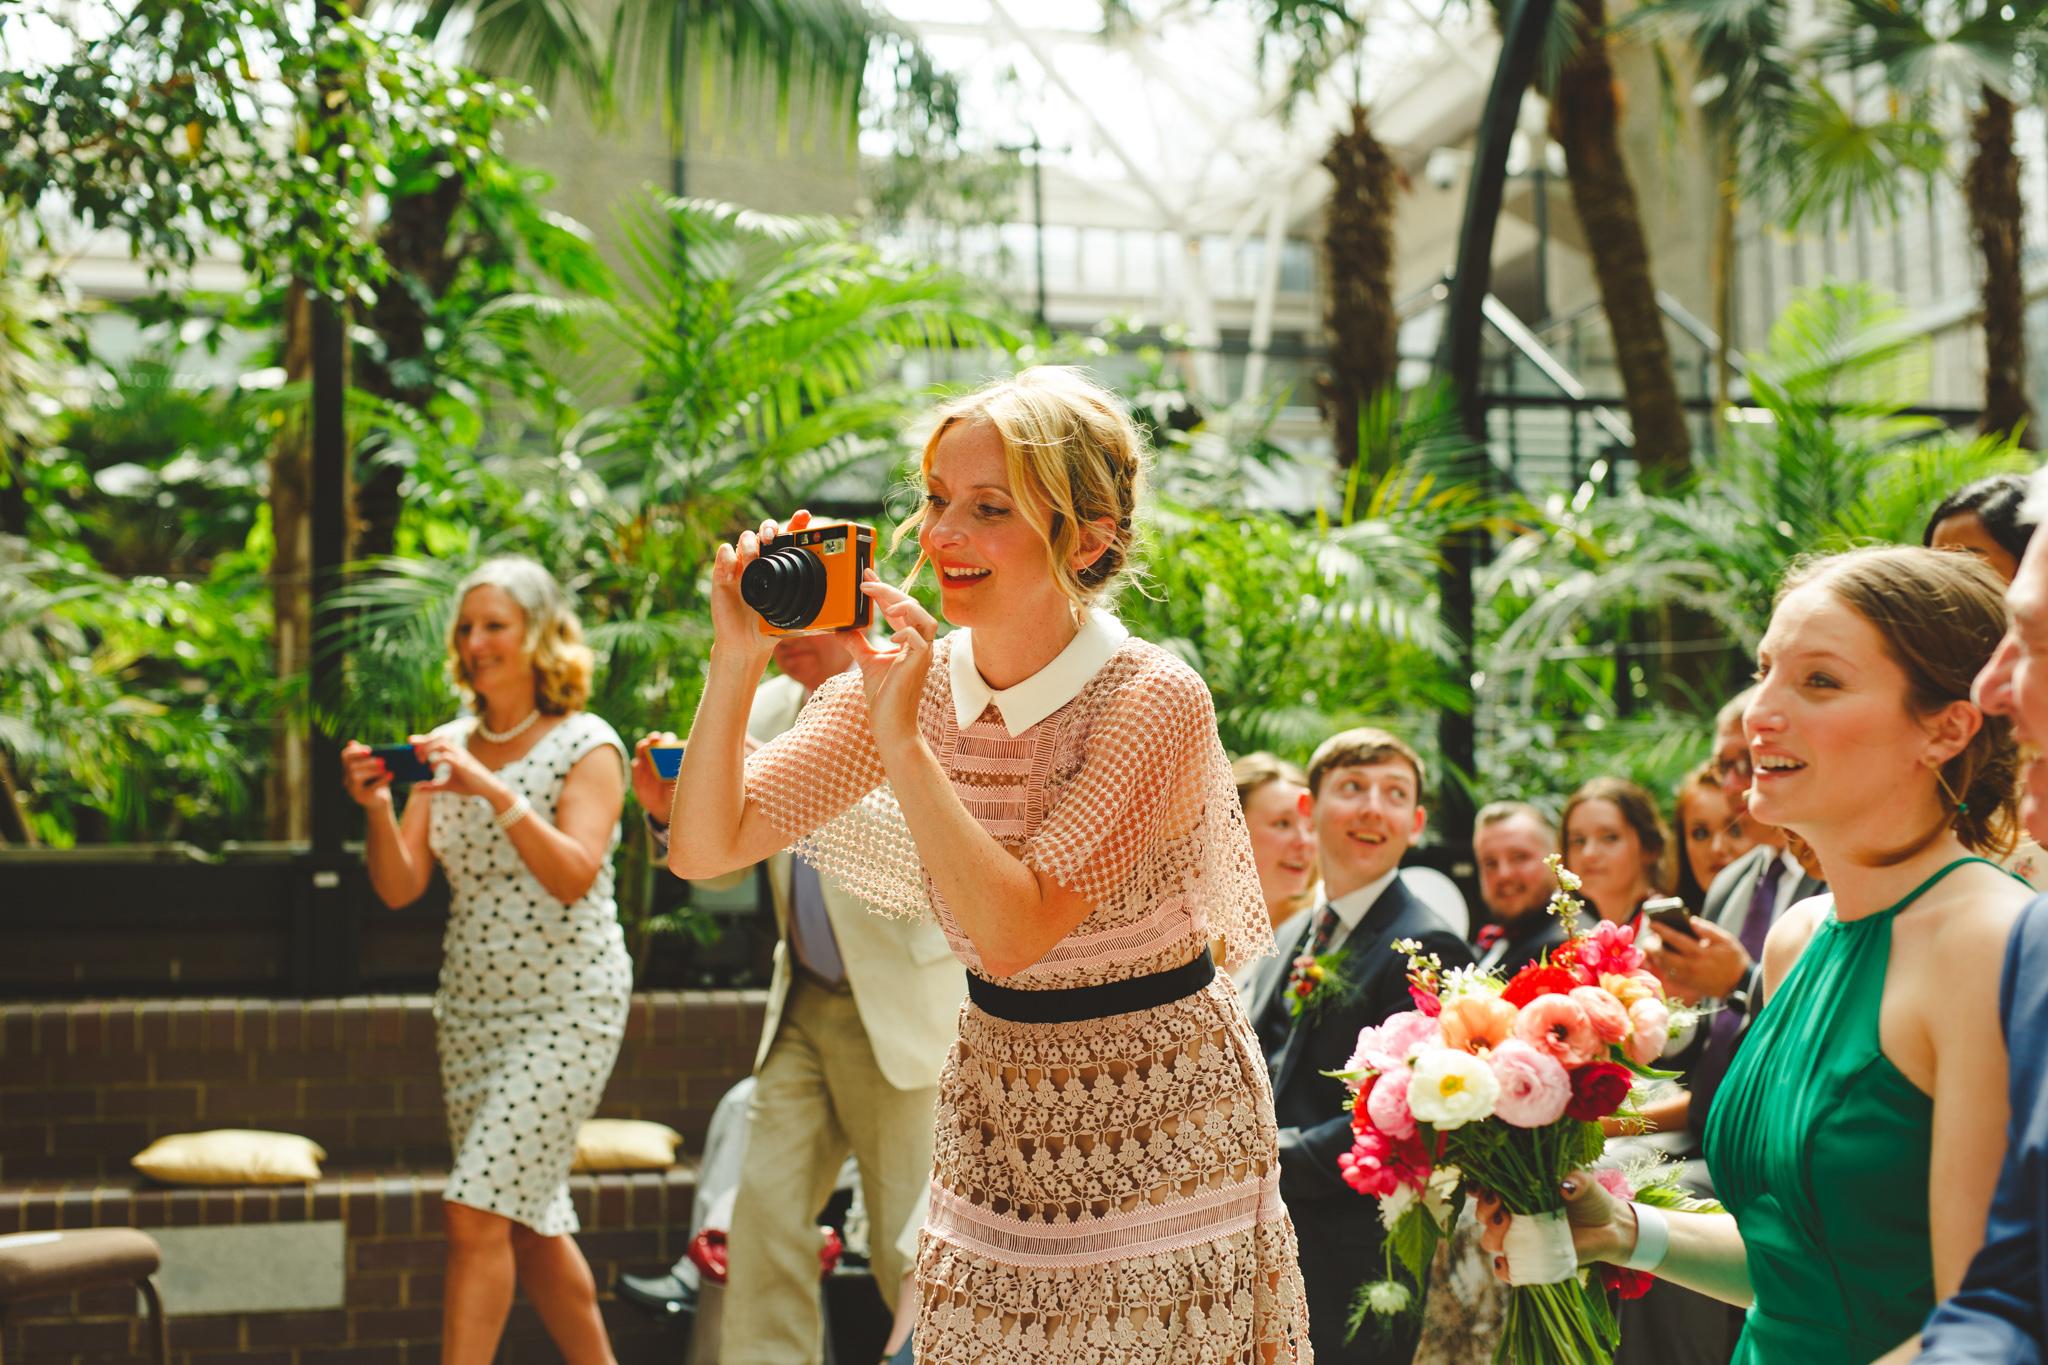 derbyshire-wedding-photographer-videographer-camera-hannah-66.jpg